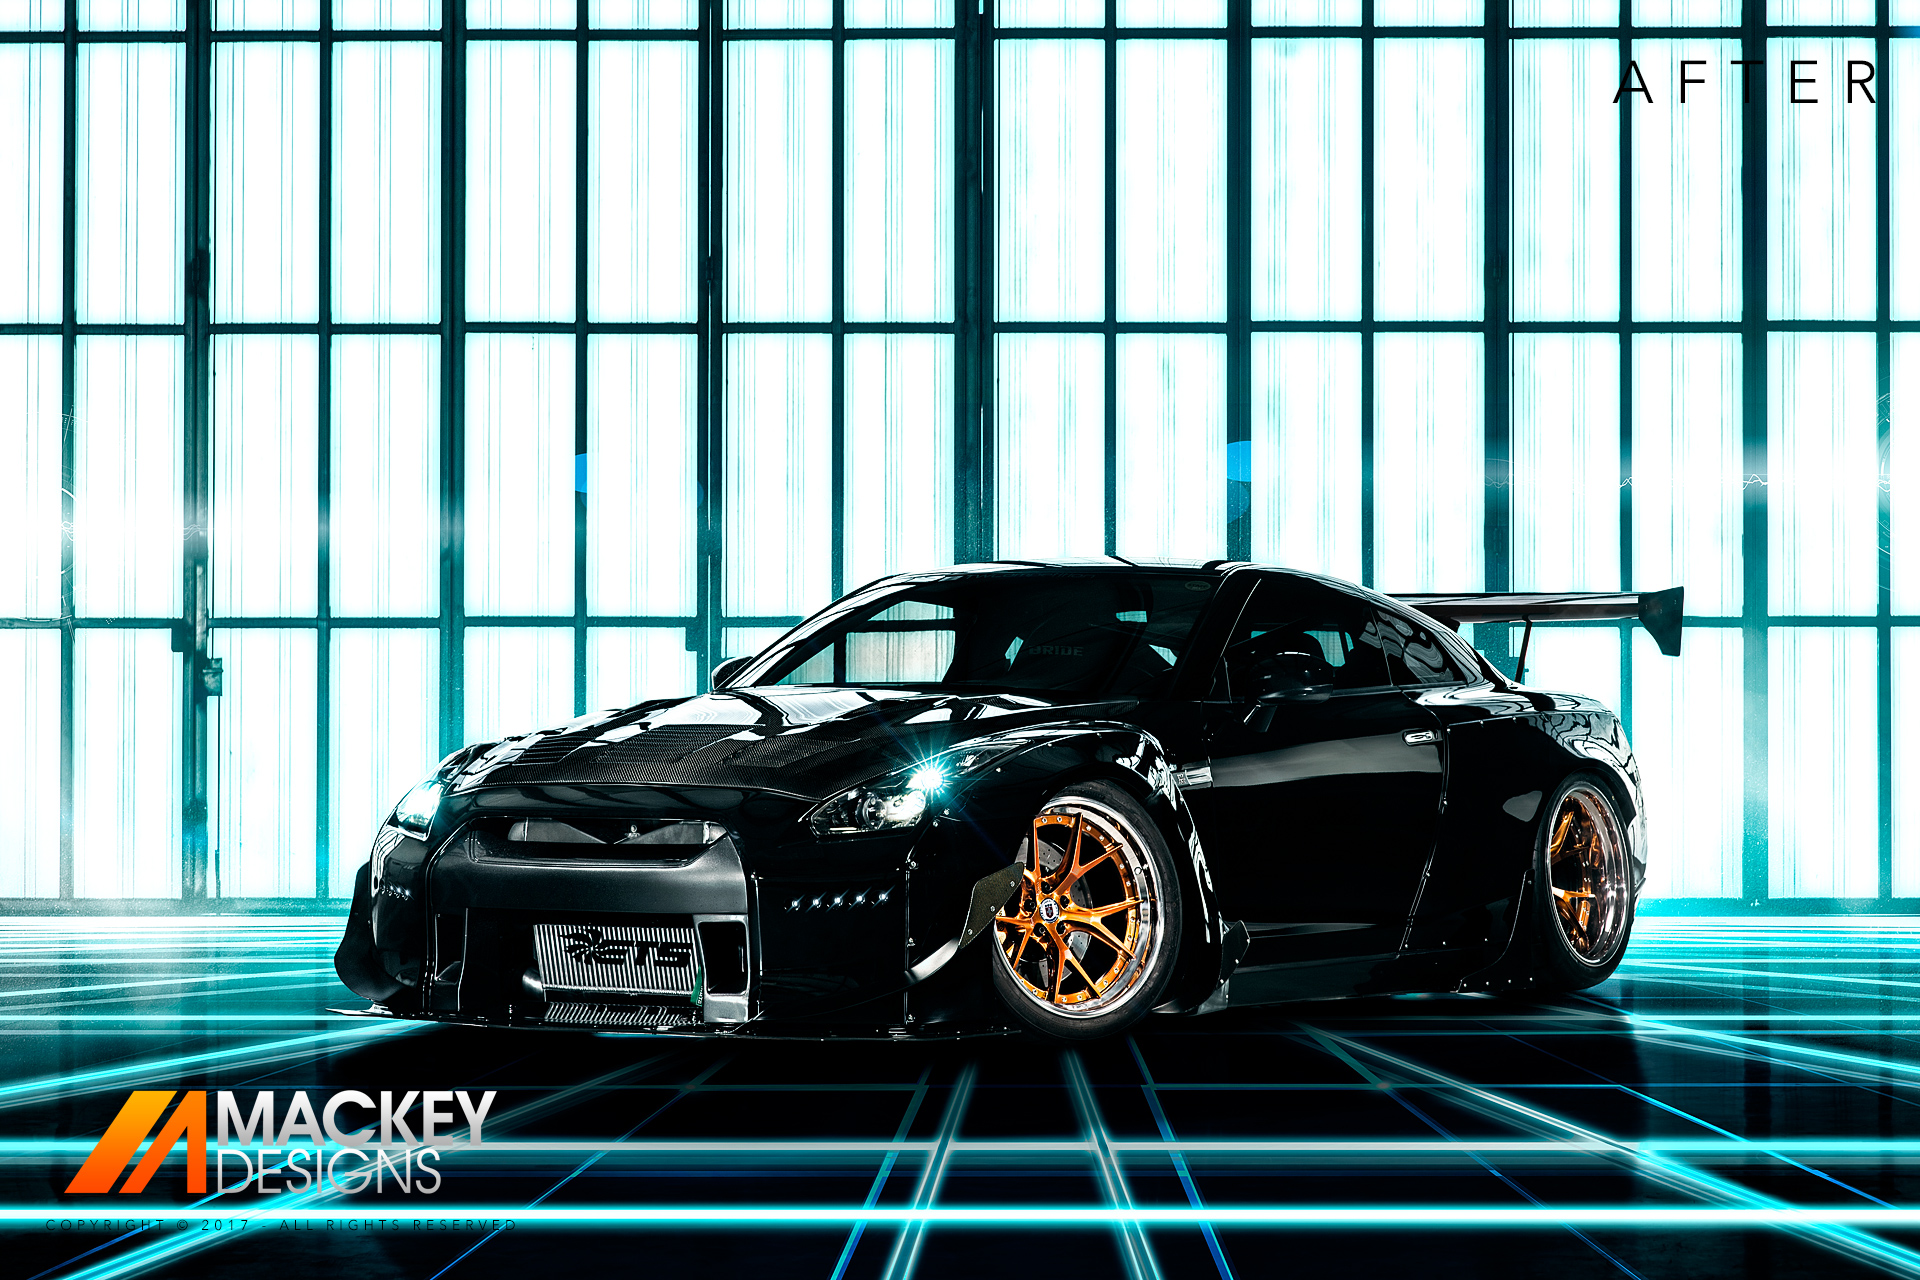 Automotive Photographer - Seattle - Josh Mackey - Rocket Bunny Nissan GTR R35 After